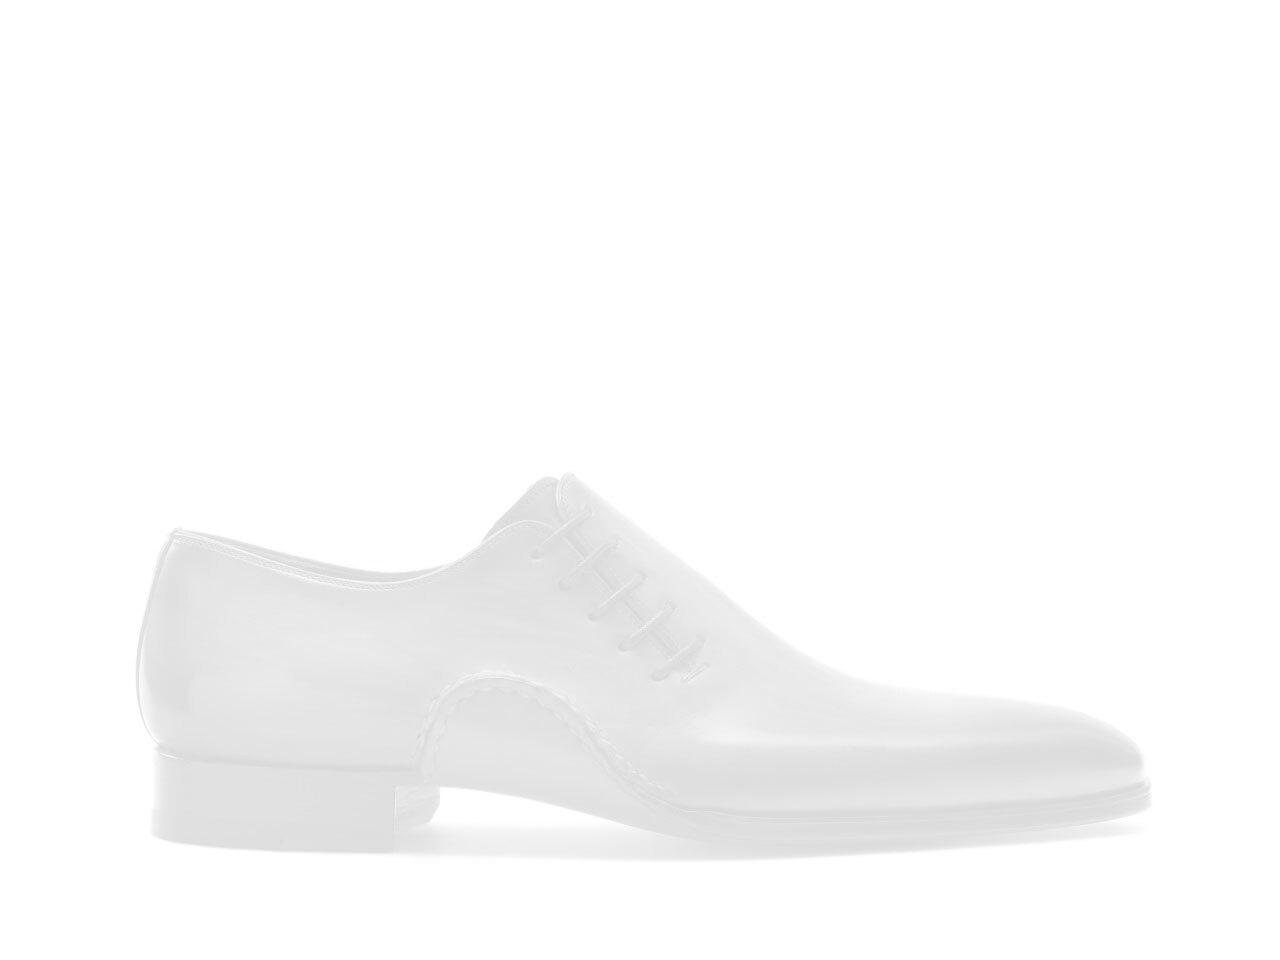 Pair of the Magnanni Rafa II Grey Men's Loafers